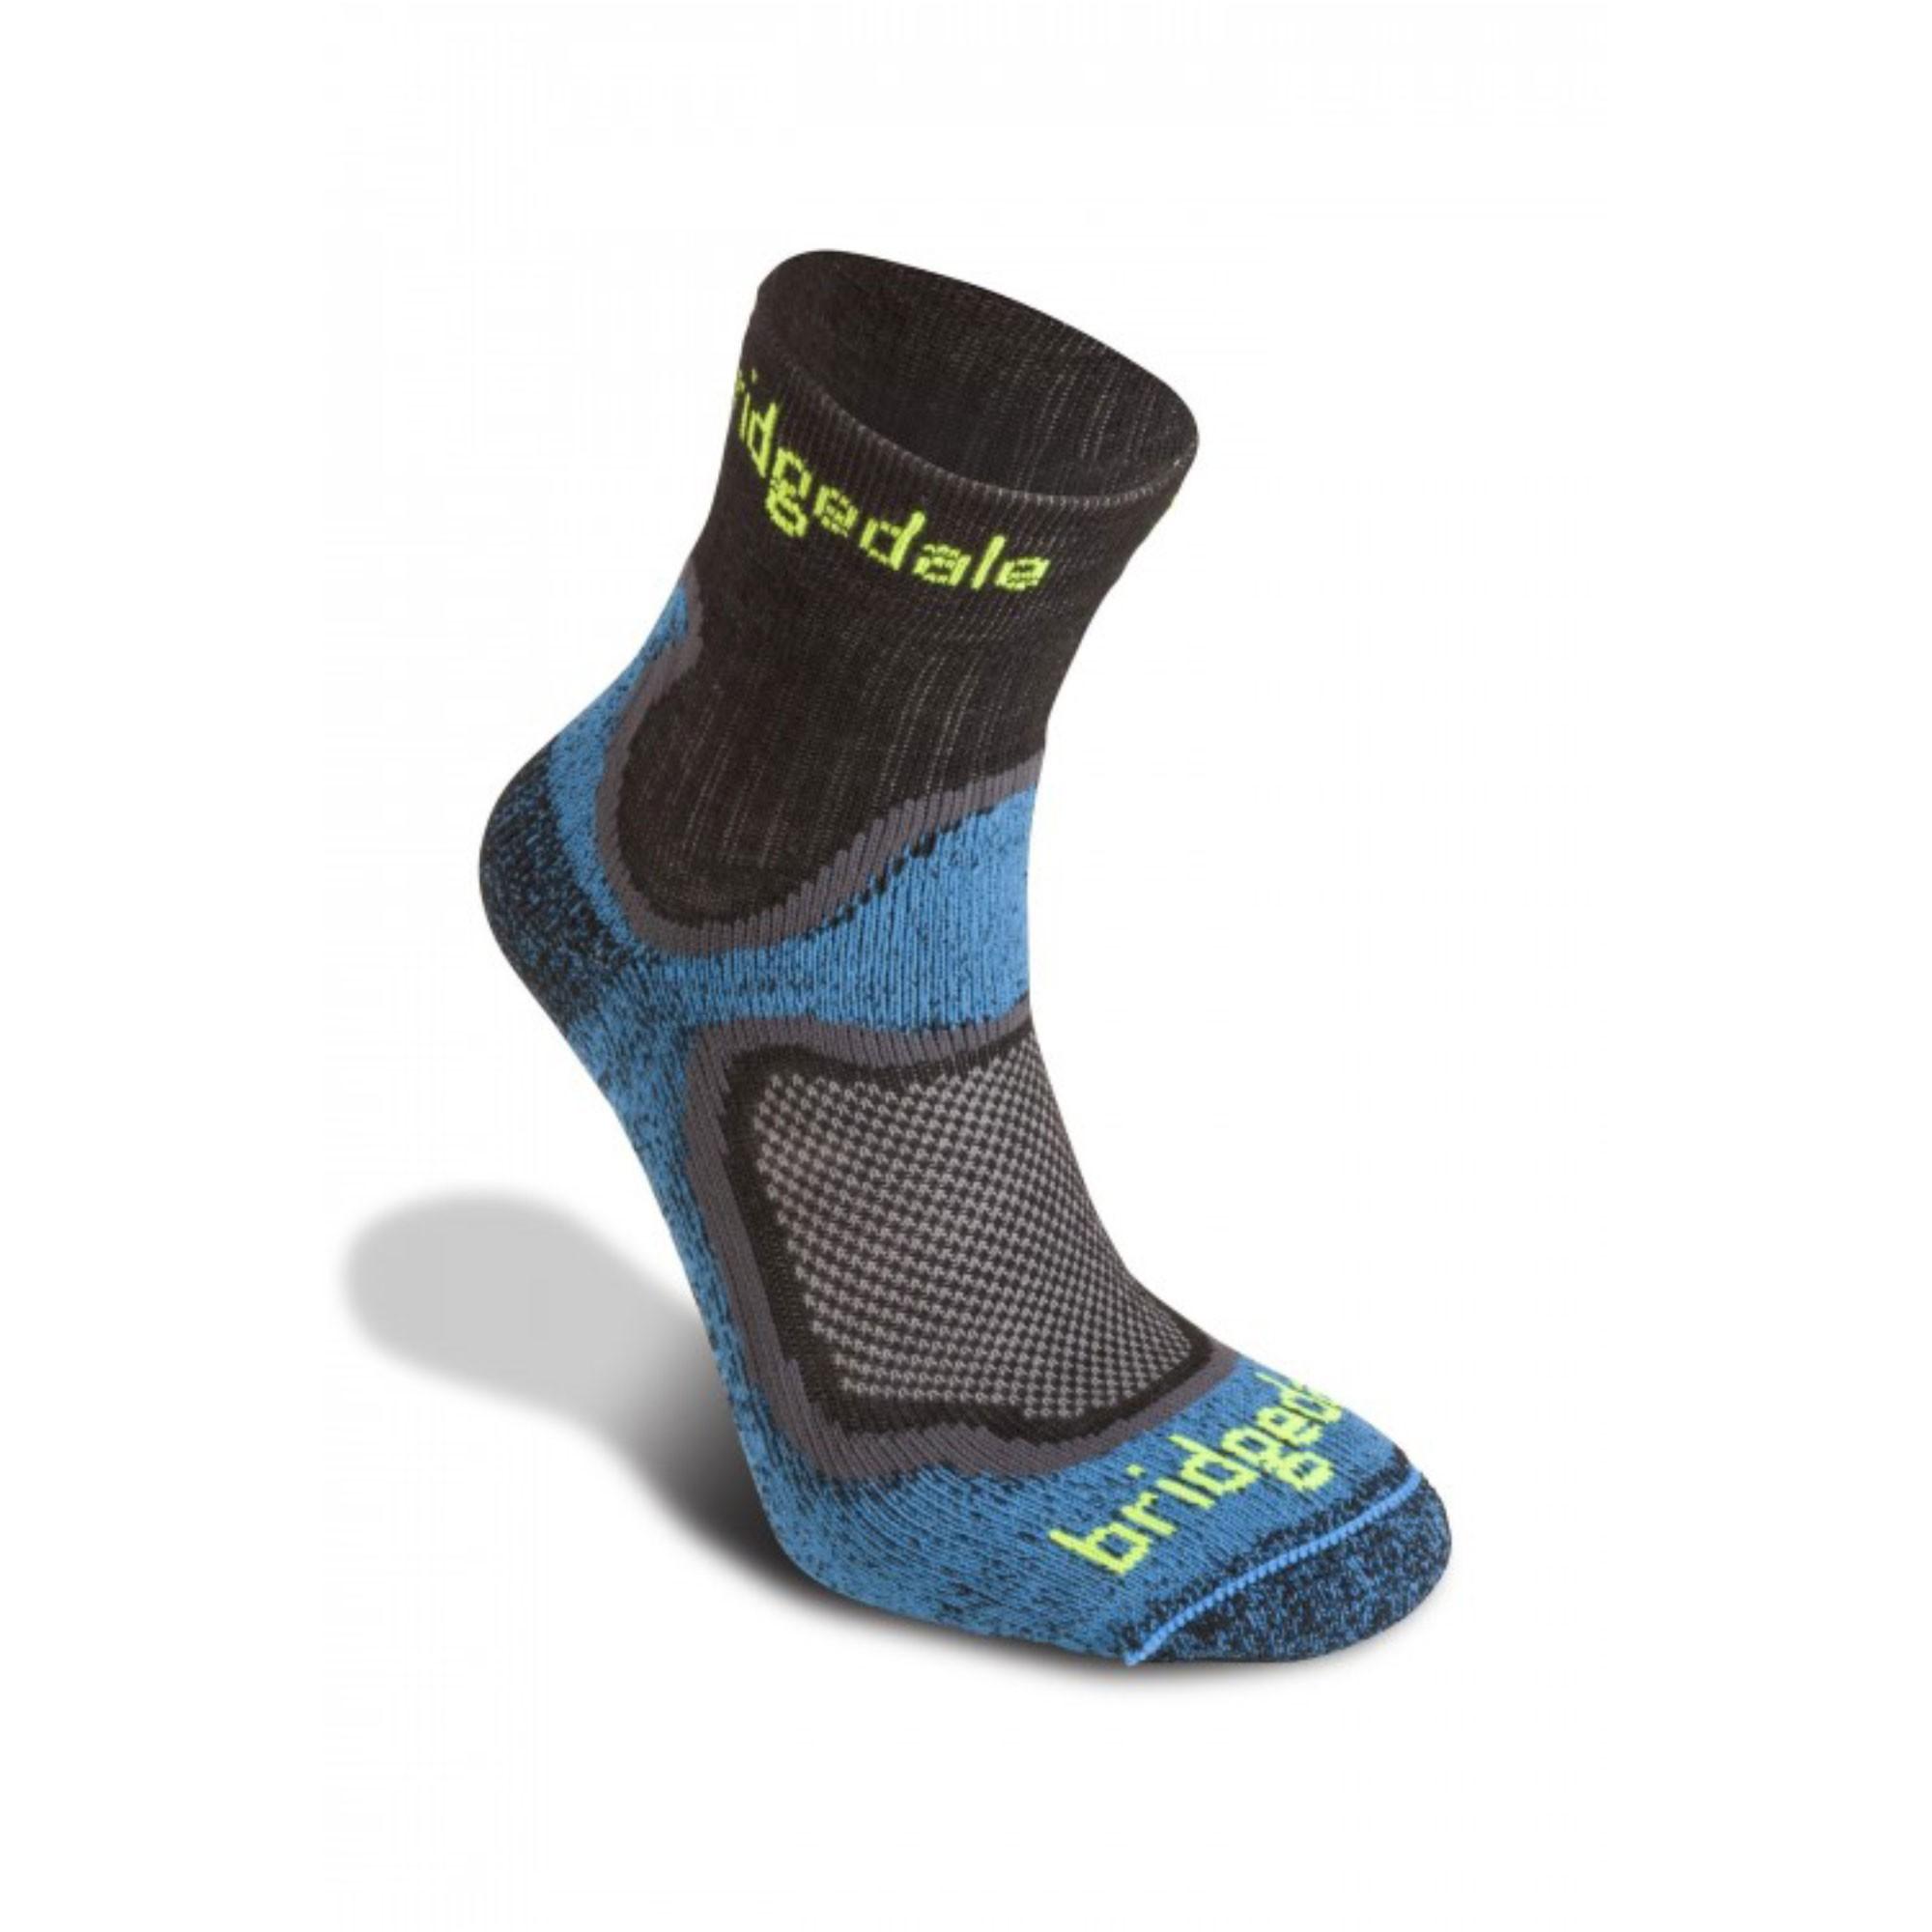 BRIDGEDALE - Speed Trail Sock - Blue/Shadow